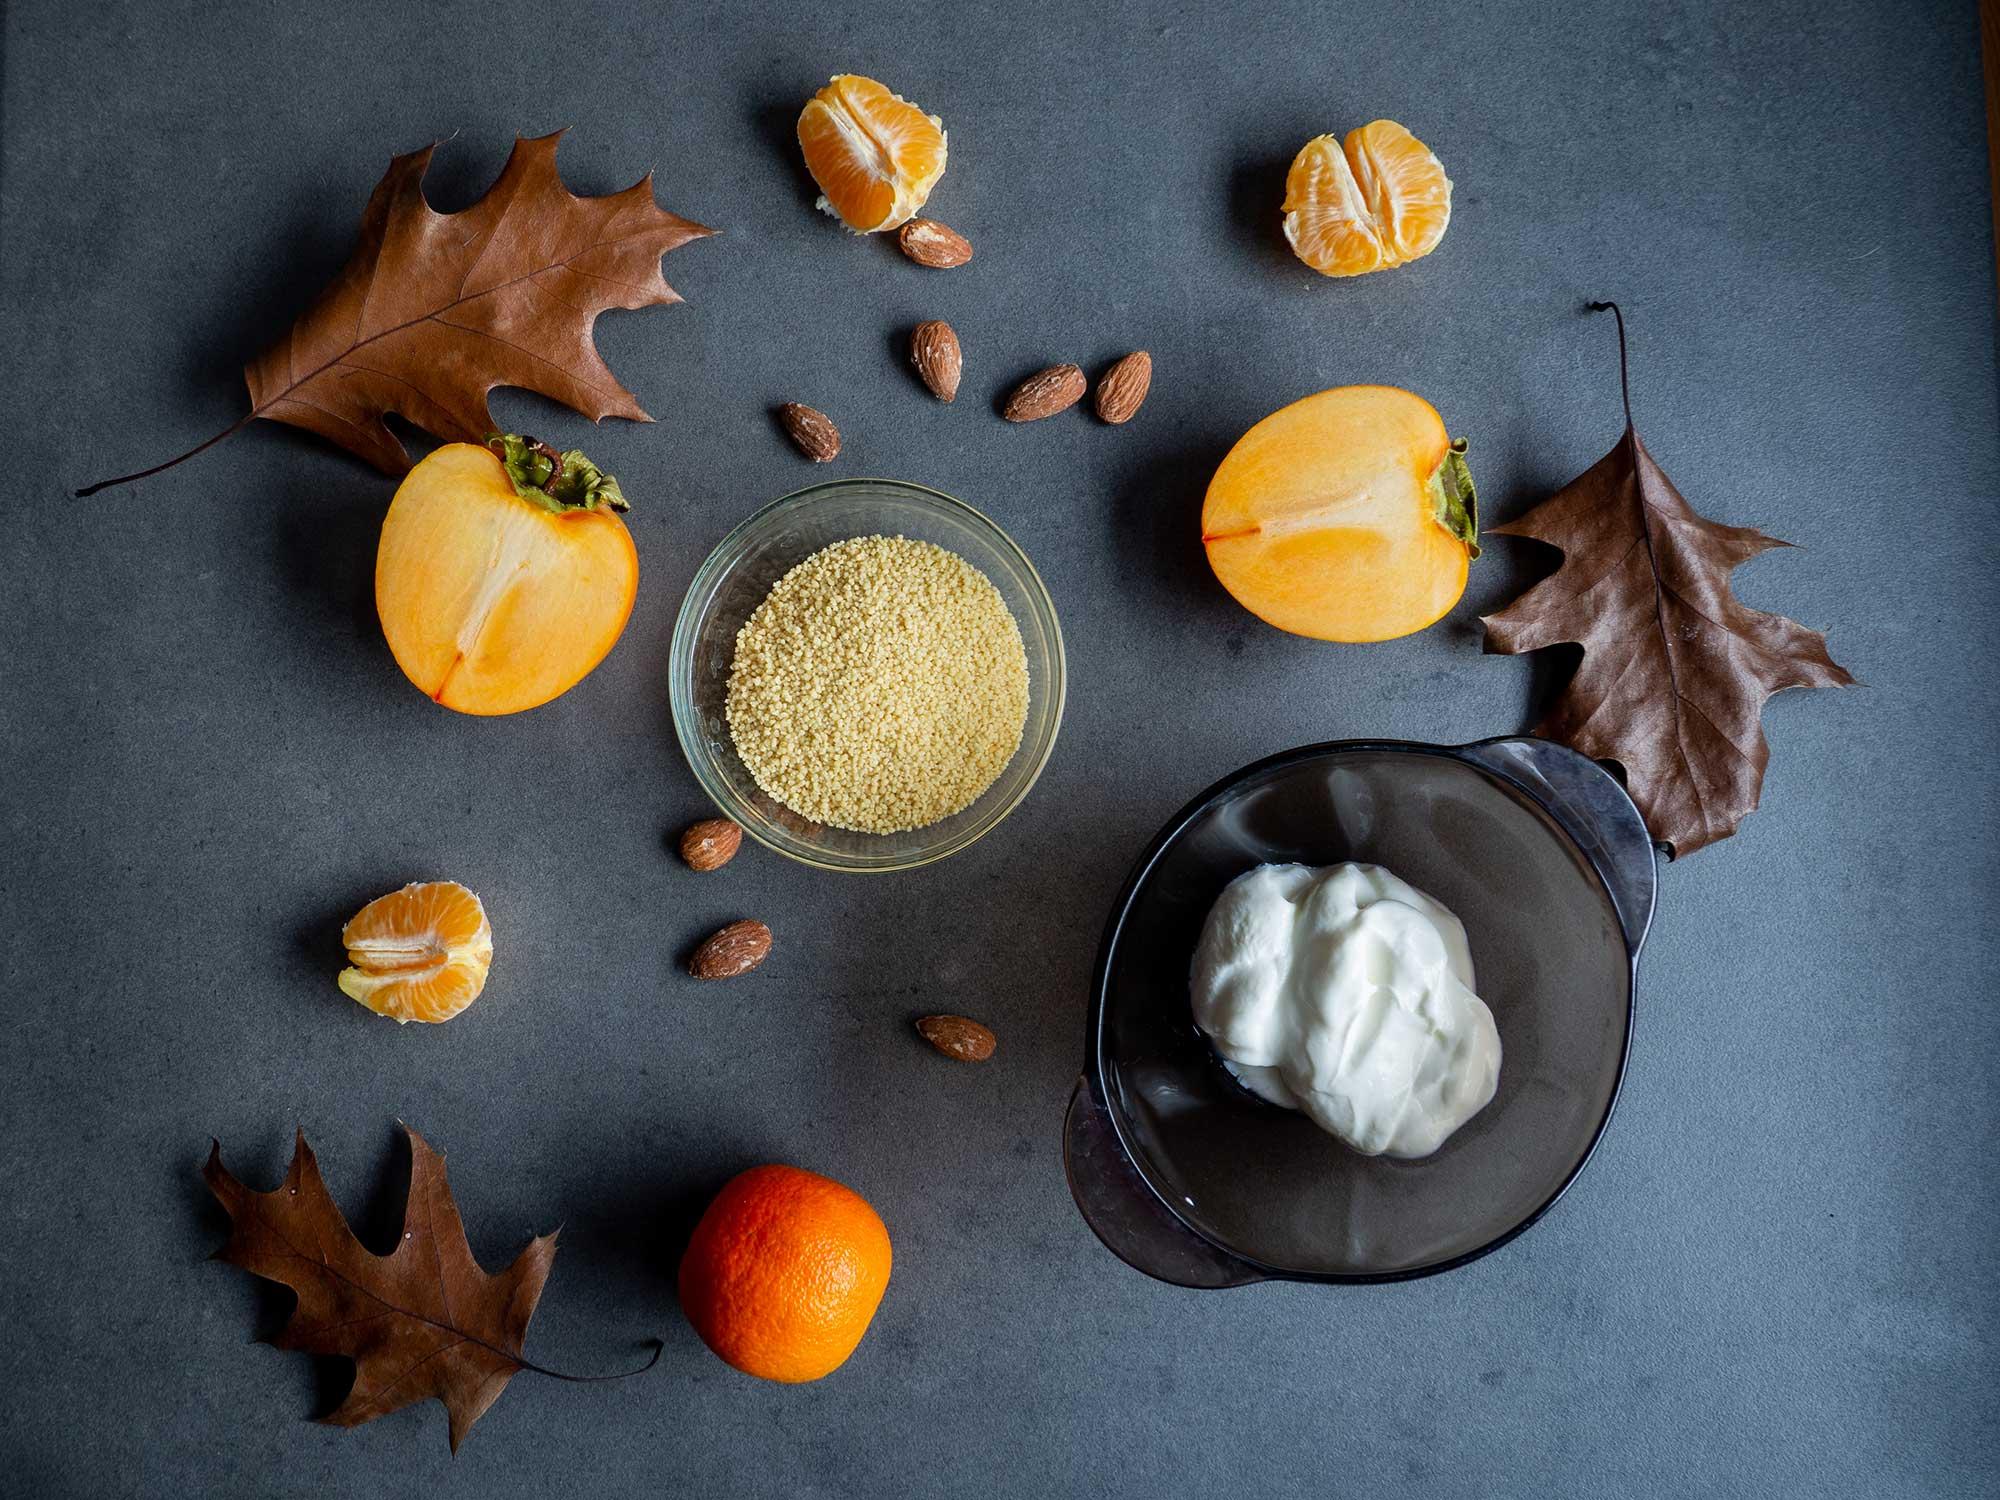 kaki, couscous, tangerine